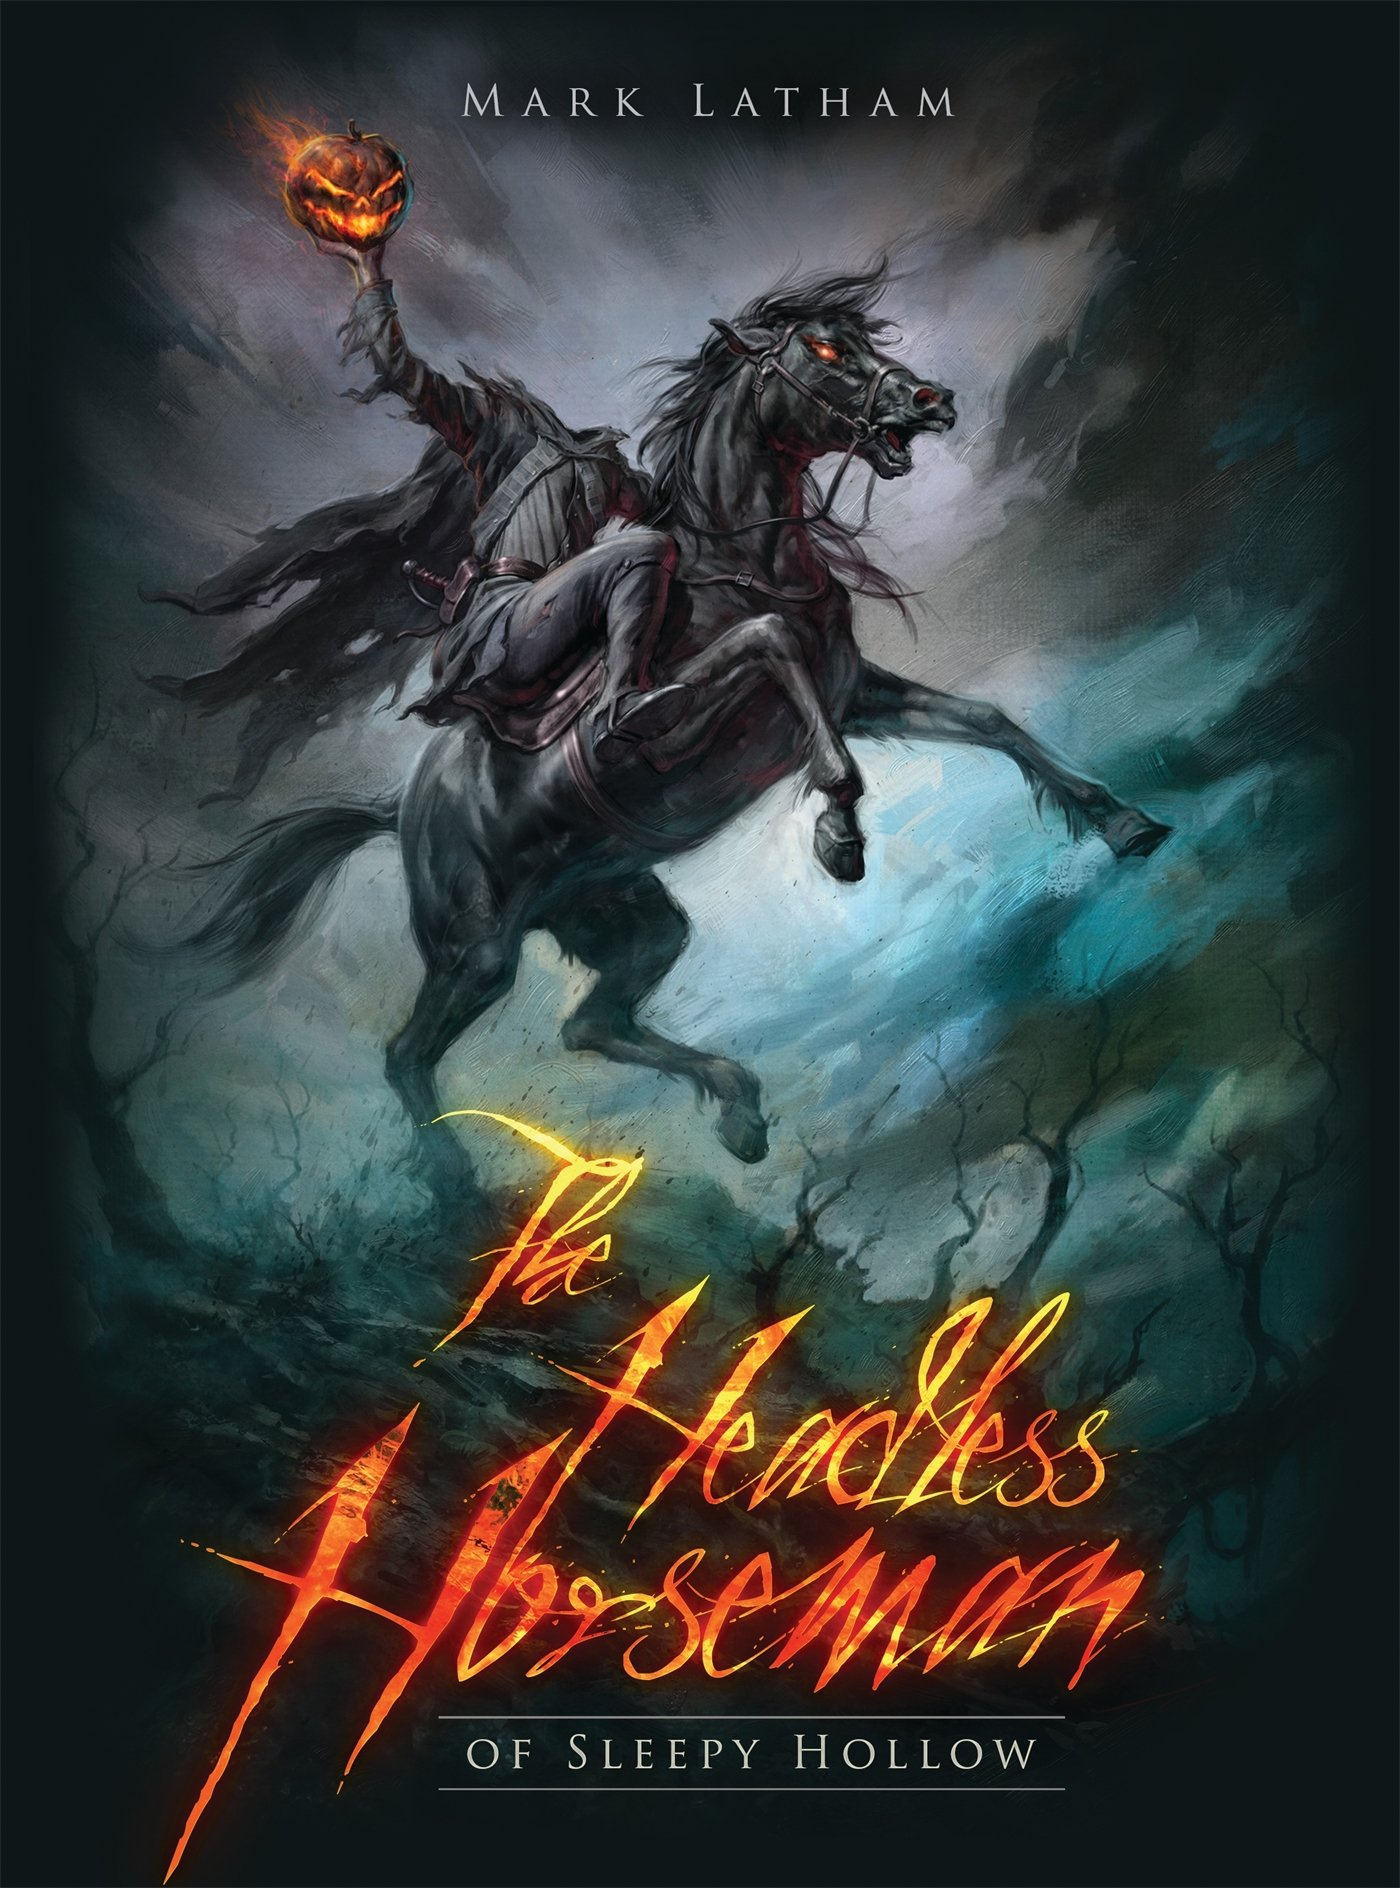 The Headless Horseman of Sleepy Hollow (Dark Osprey): Amazon.es: Latham, Mark, Lathwell, Alan: Libros en idiomas extranjeros